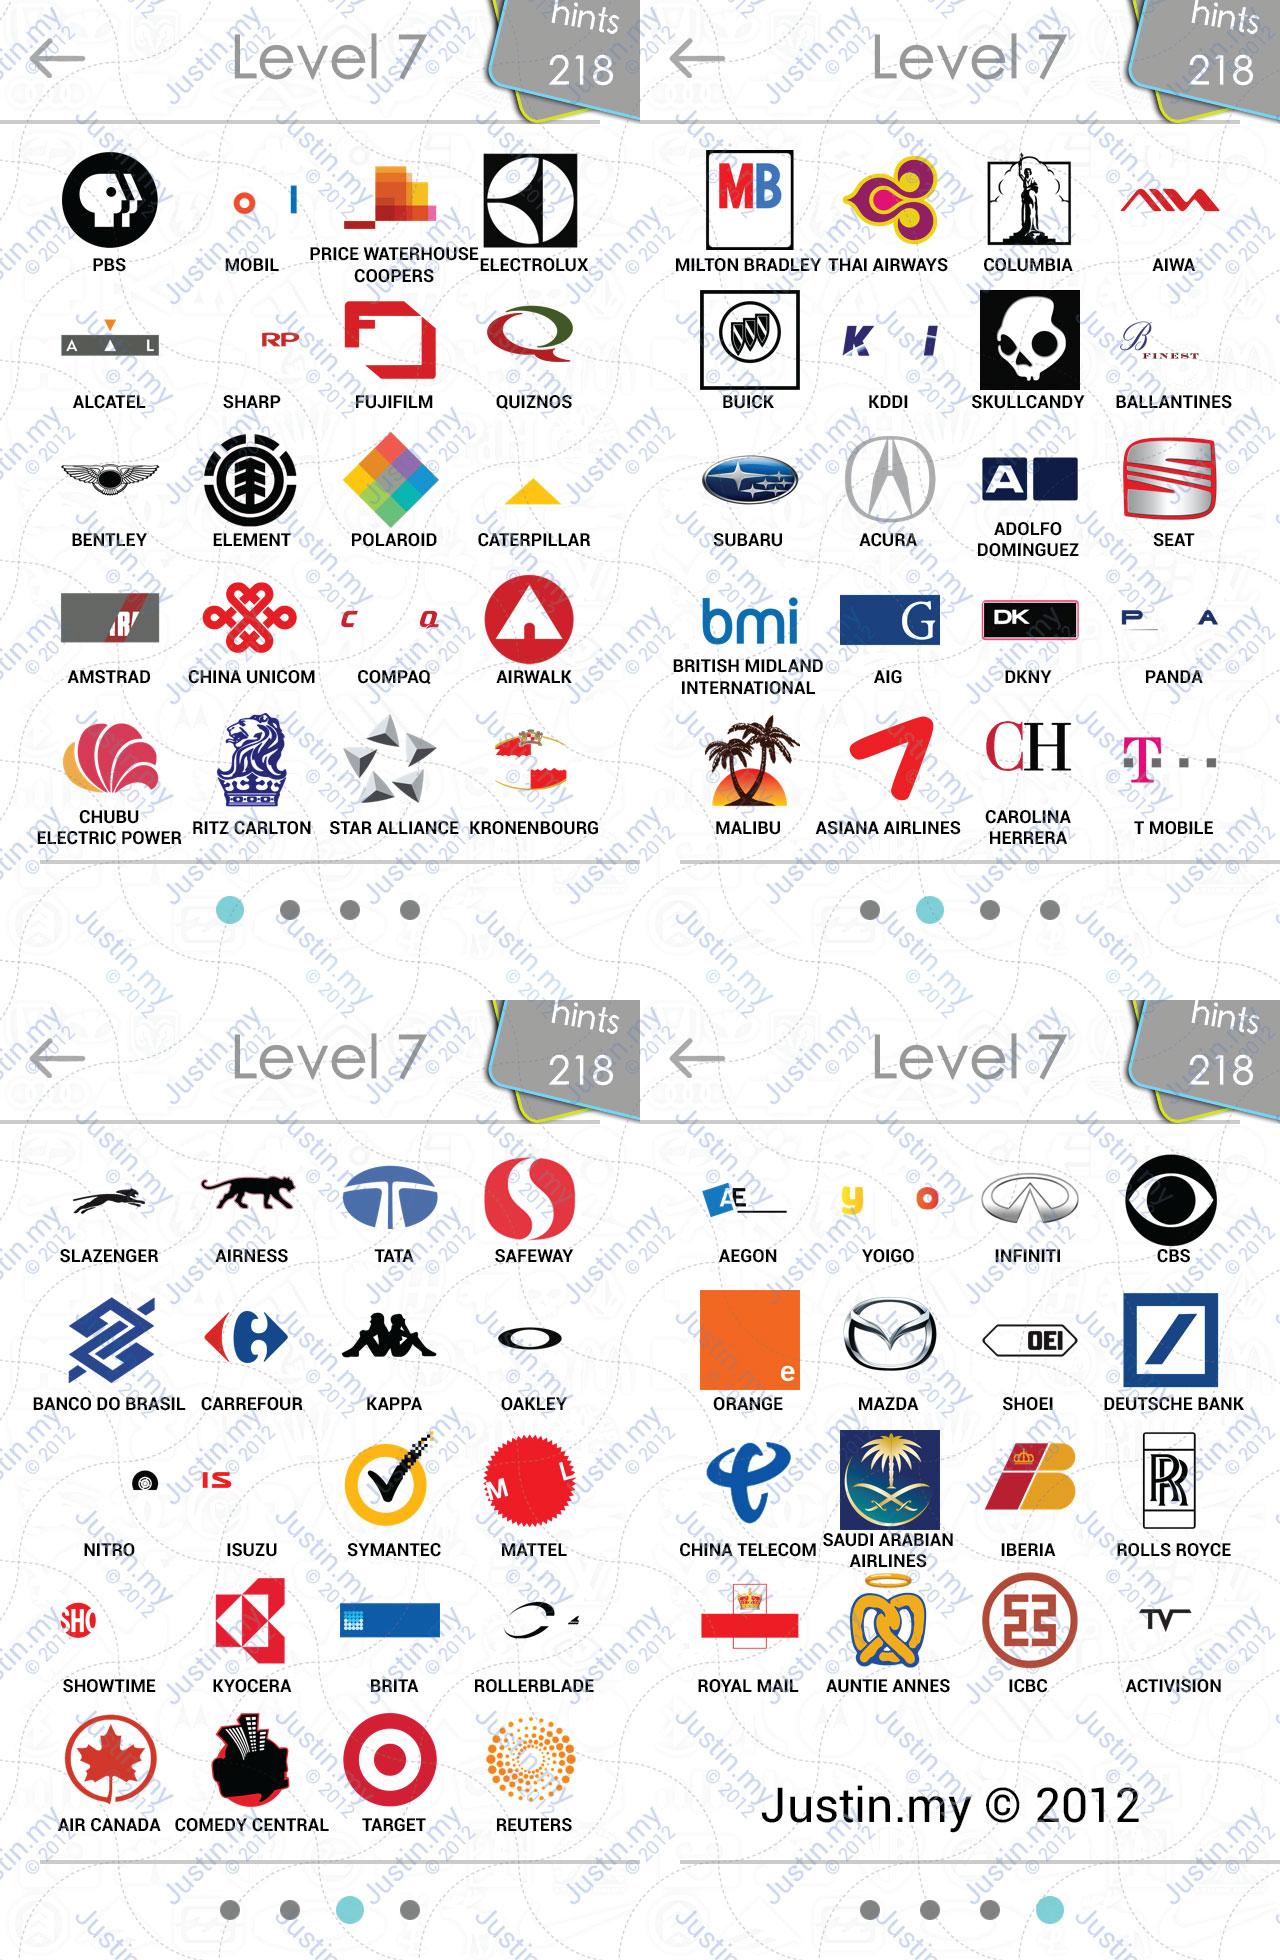 Logos Answers Level 7 : logos, answers, level, Logos, Answers, IPhone,, IPad,, IPod,, Android